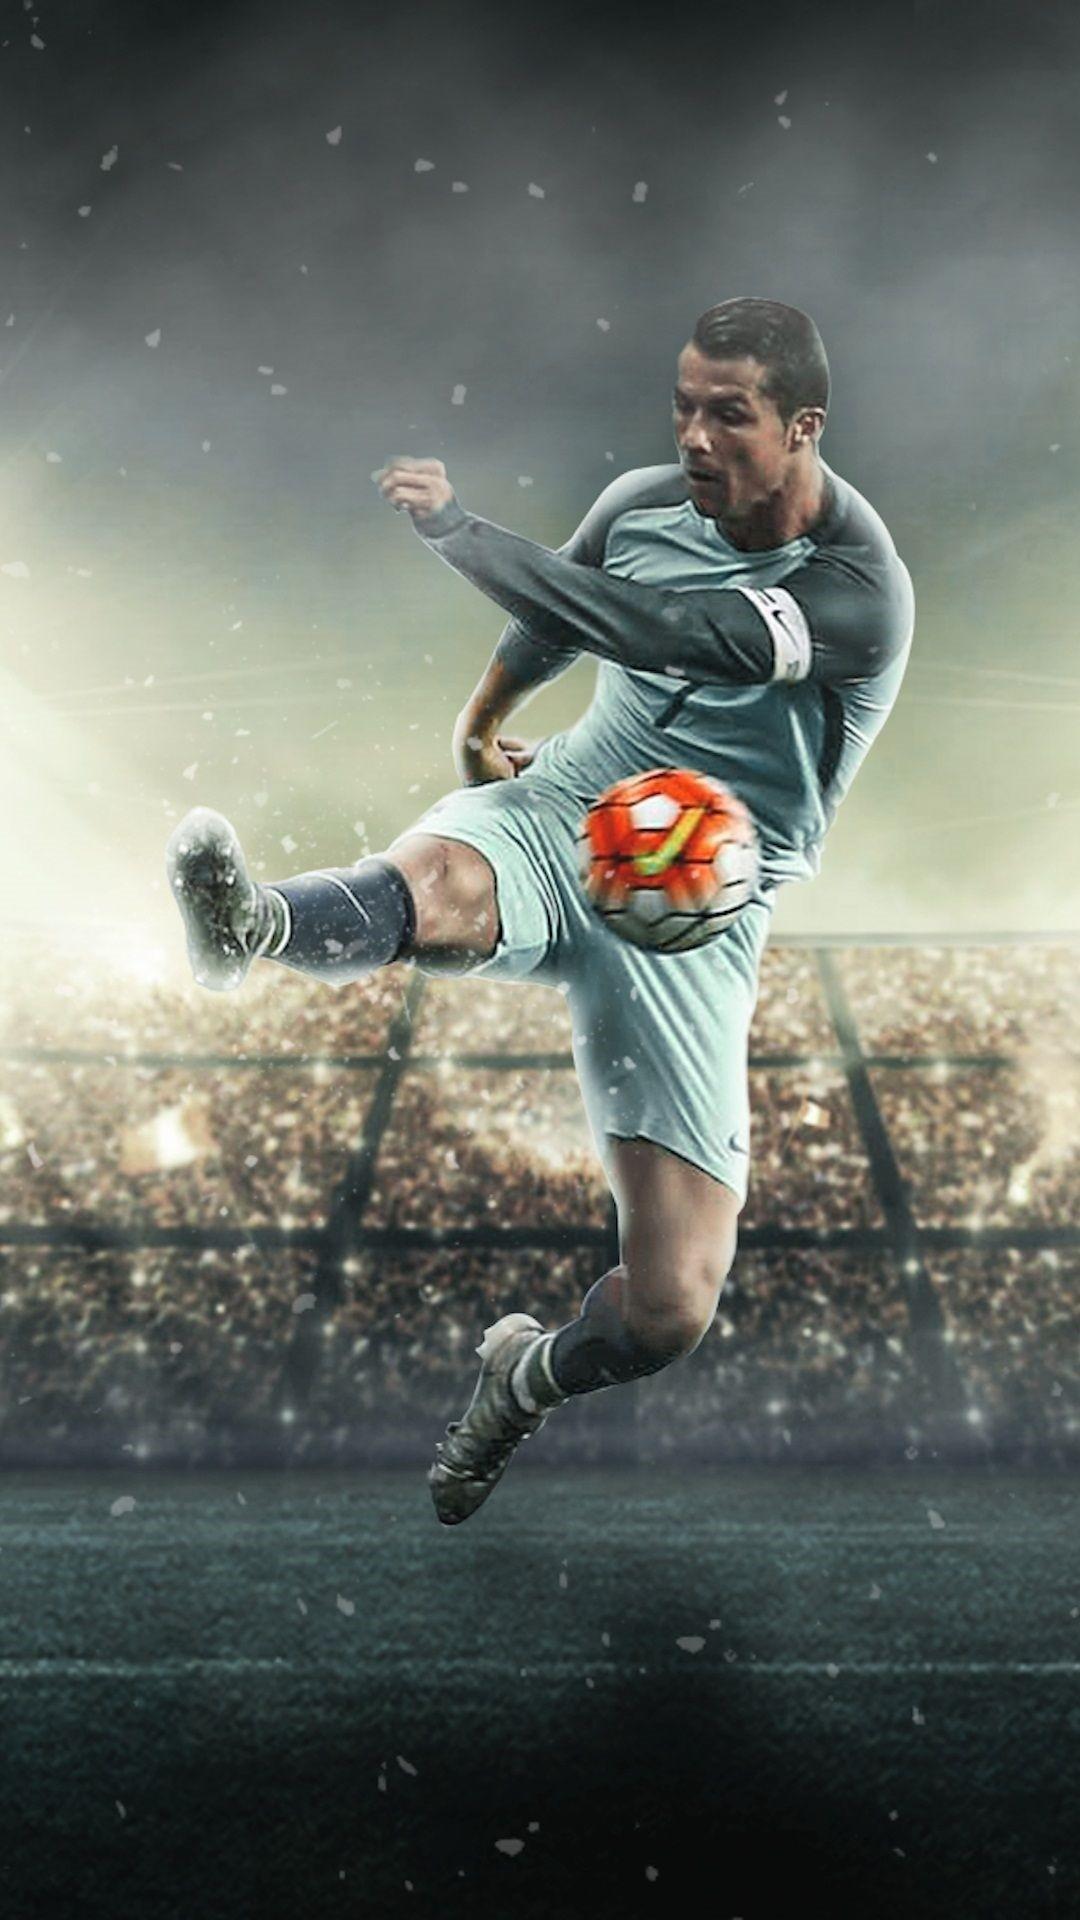 Cool Soccer hd wallpaper